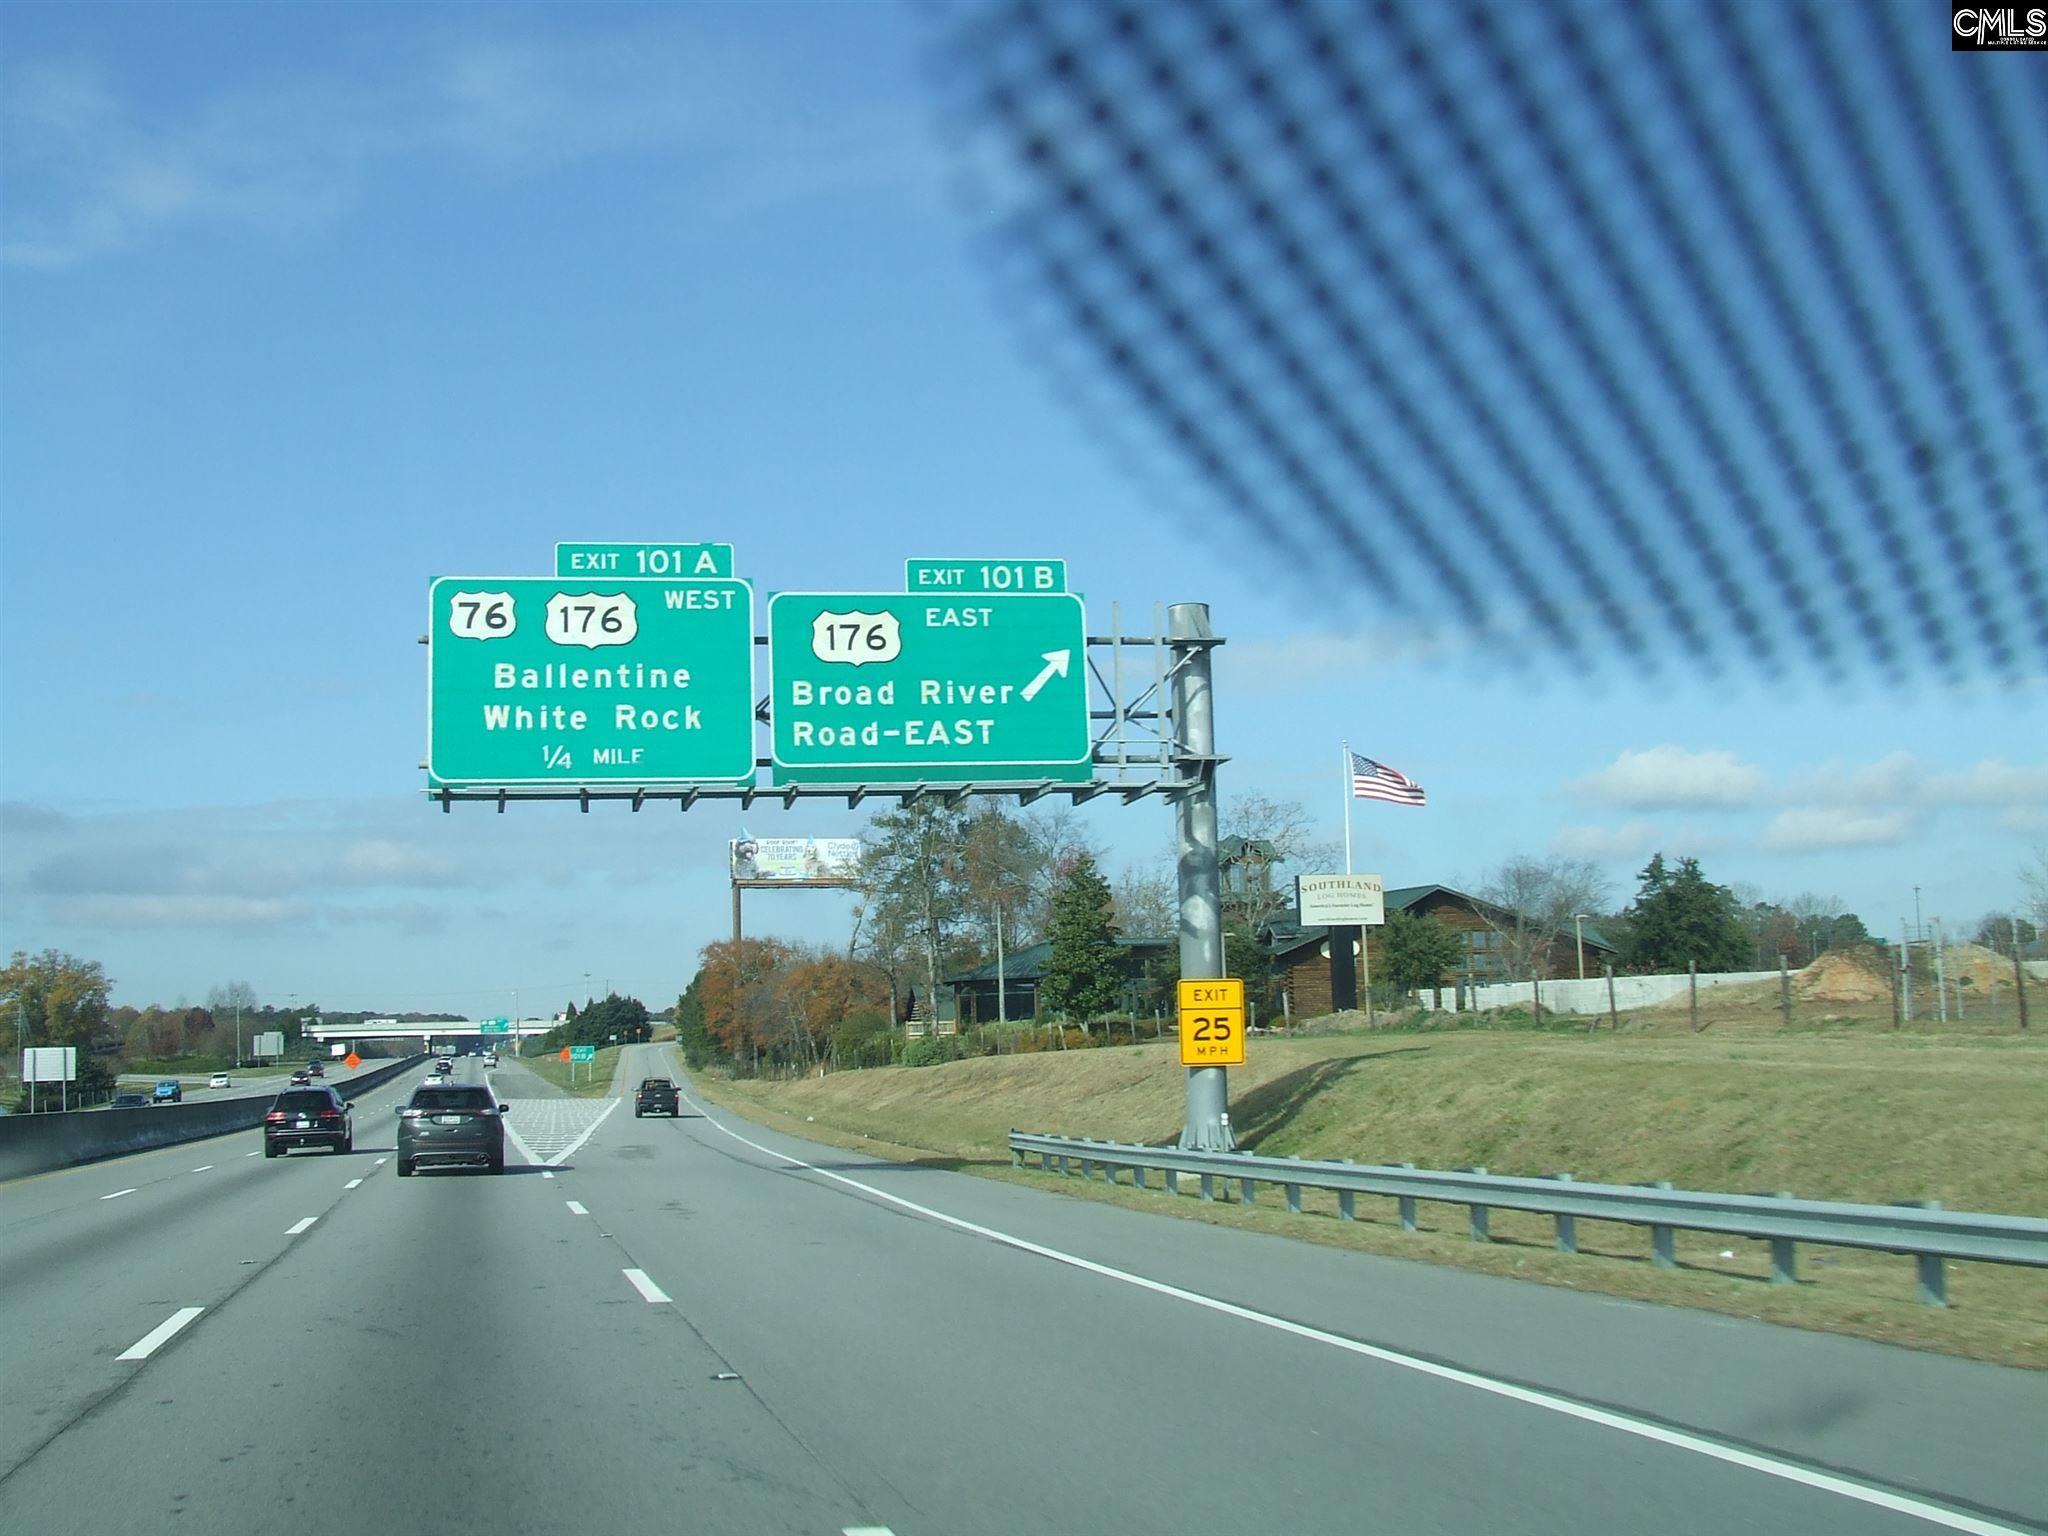 1013 N. Wingard Road Irmo, SC 29063